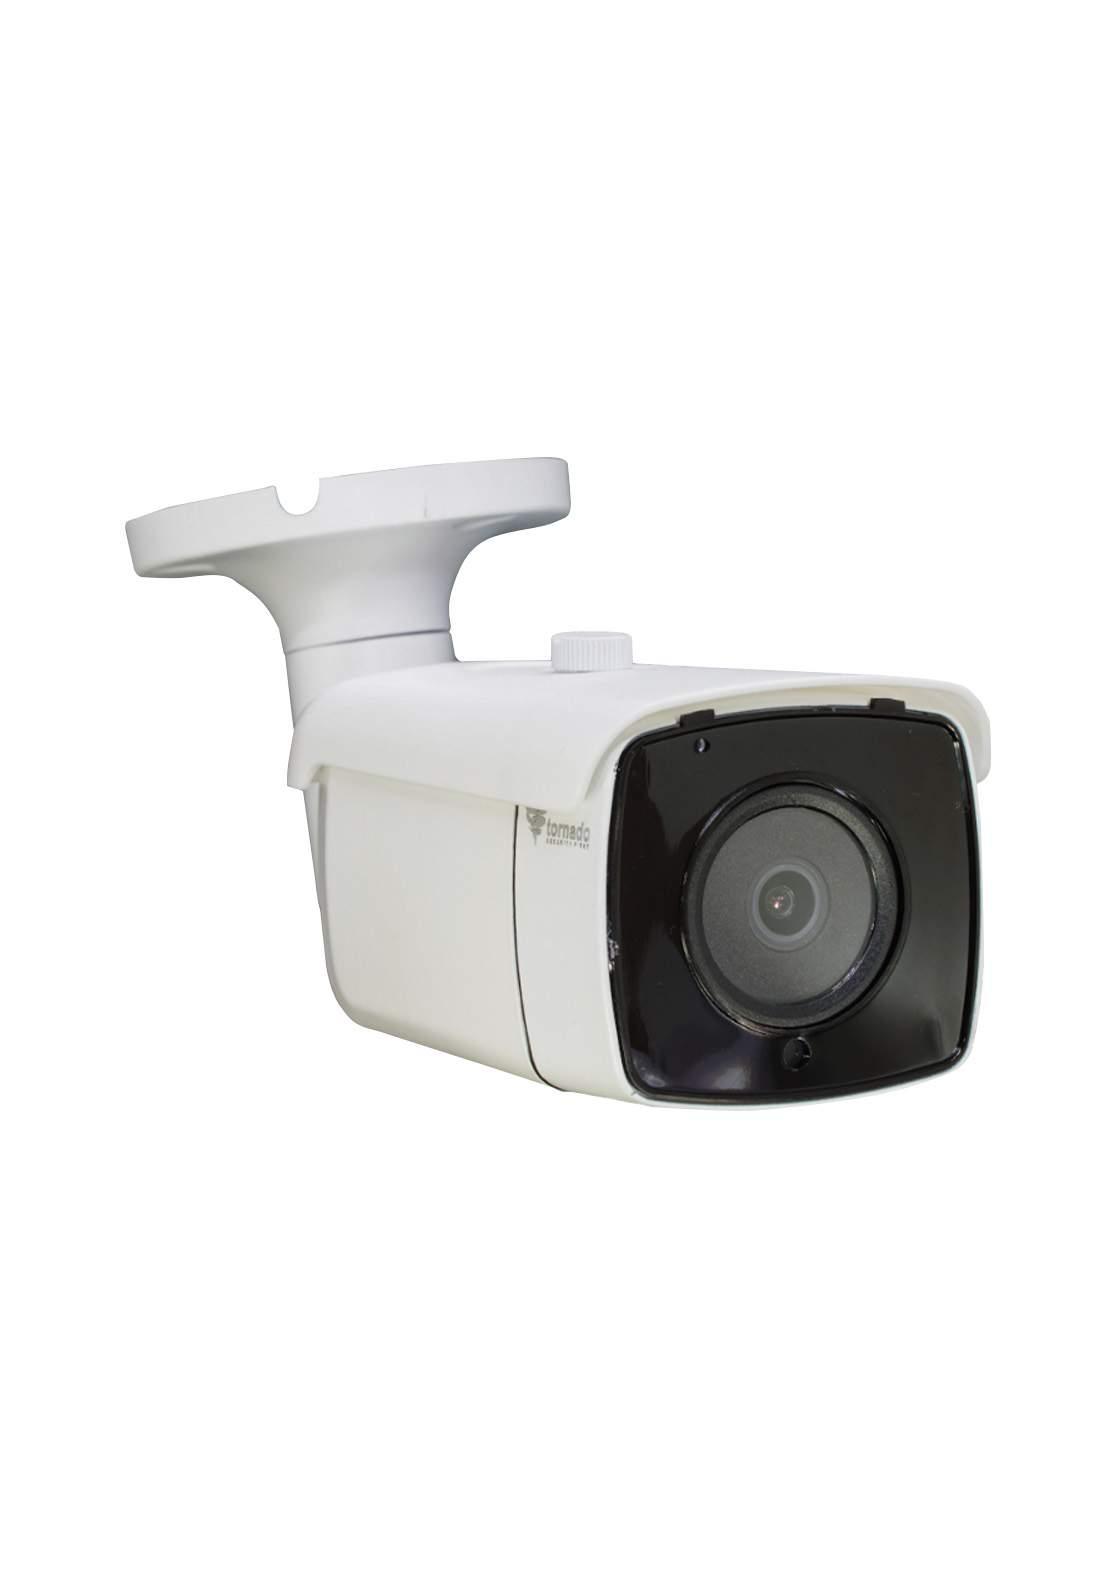 Tornado B-6002 AHD 2mp Security Camera - White  كاميرا مراقبة